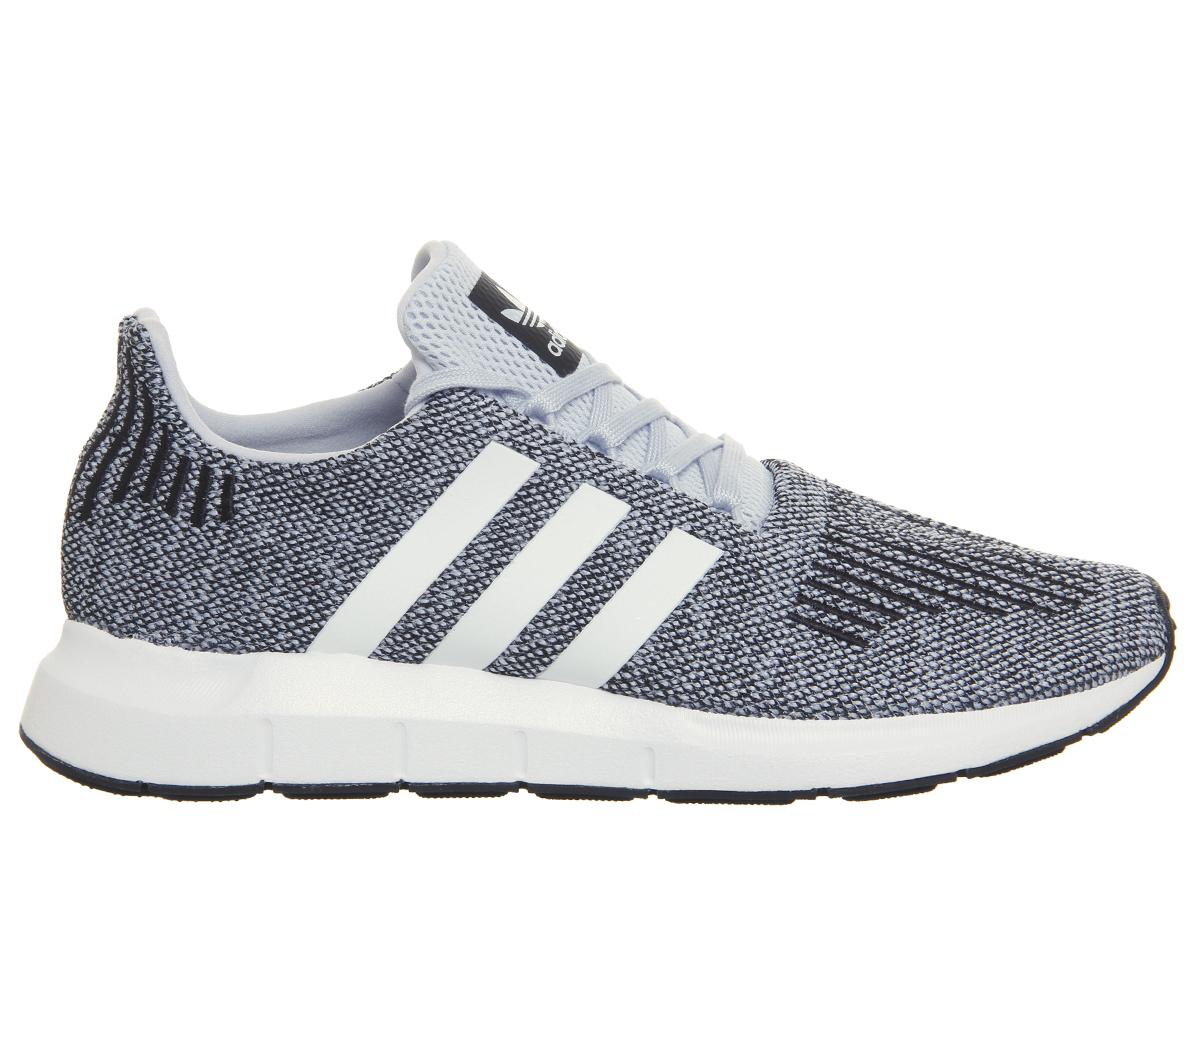 525bbc08c0766c Sentinel Mens Adidas Swift Run Trainers AERO BLUE WHITE Trainers Shoes